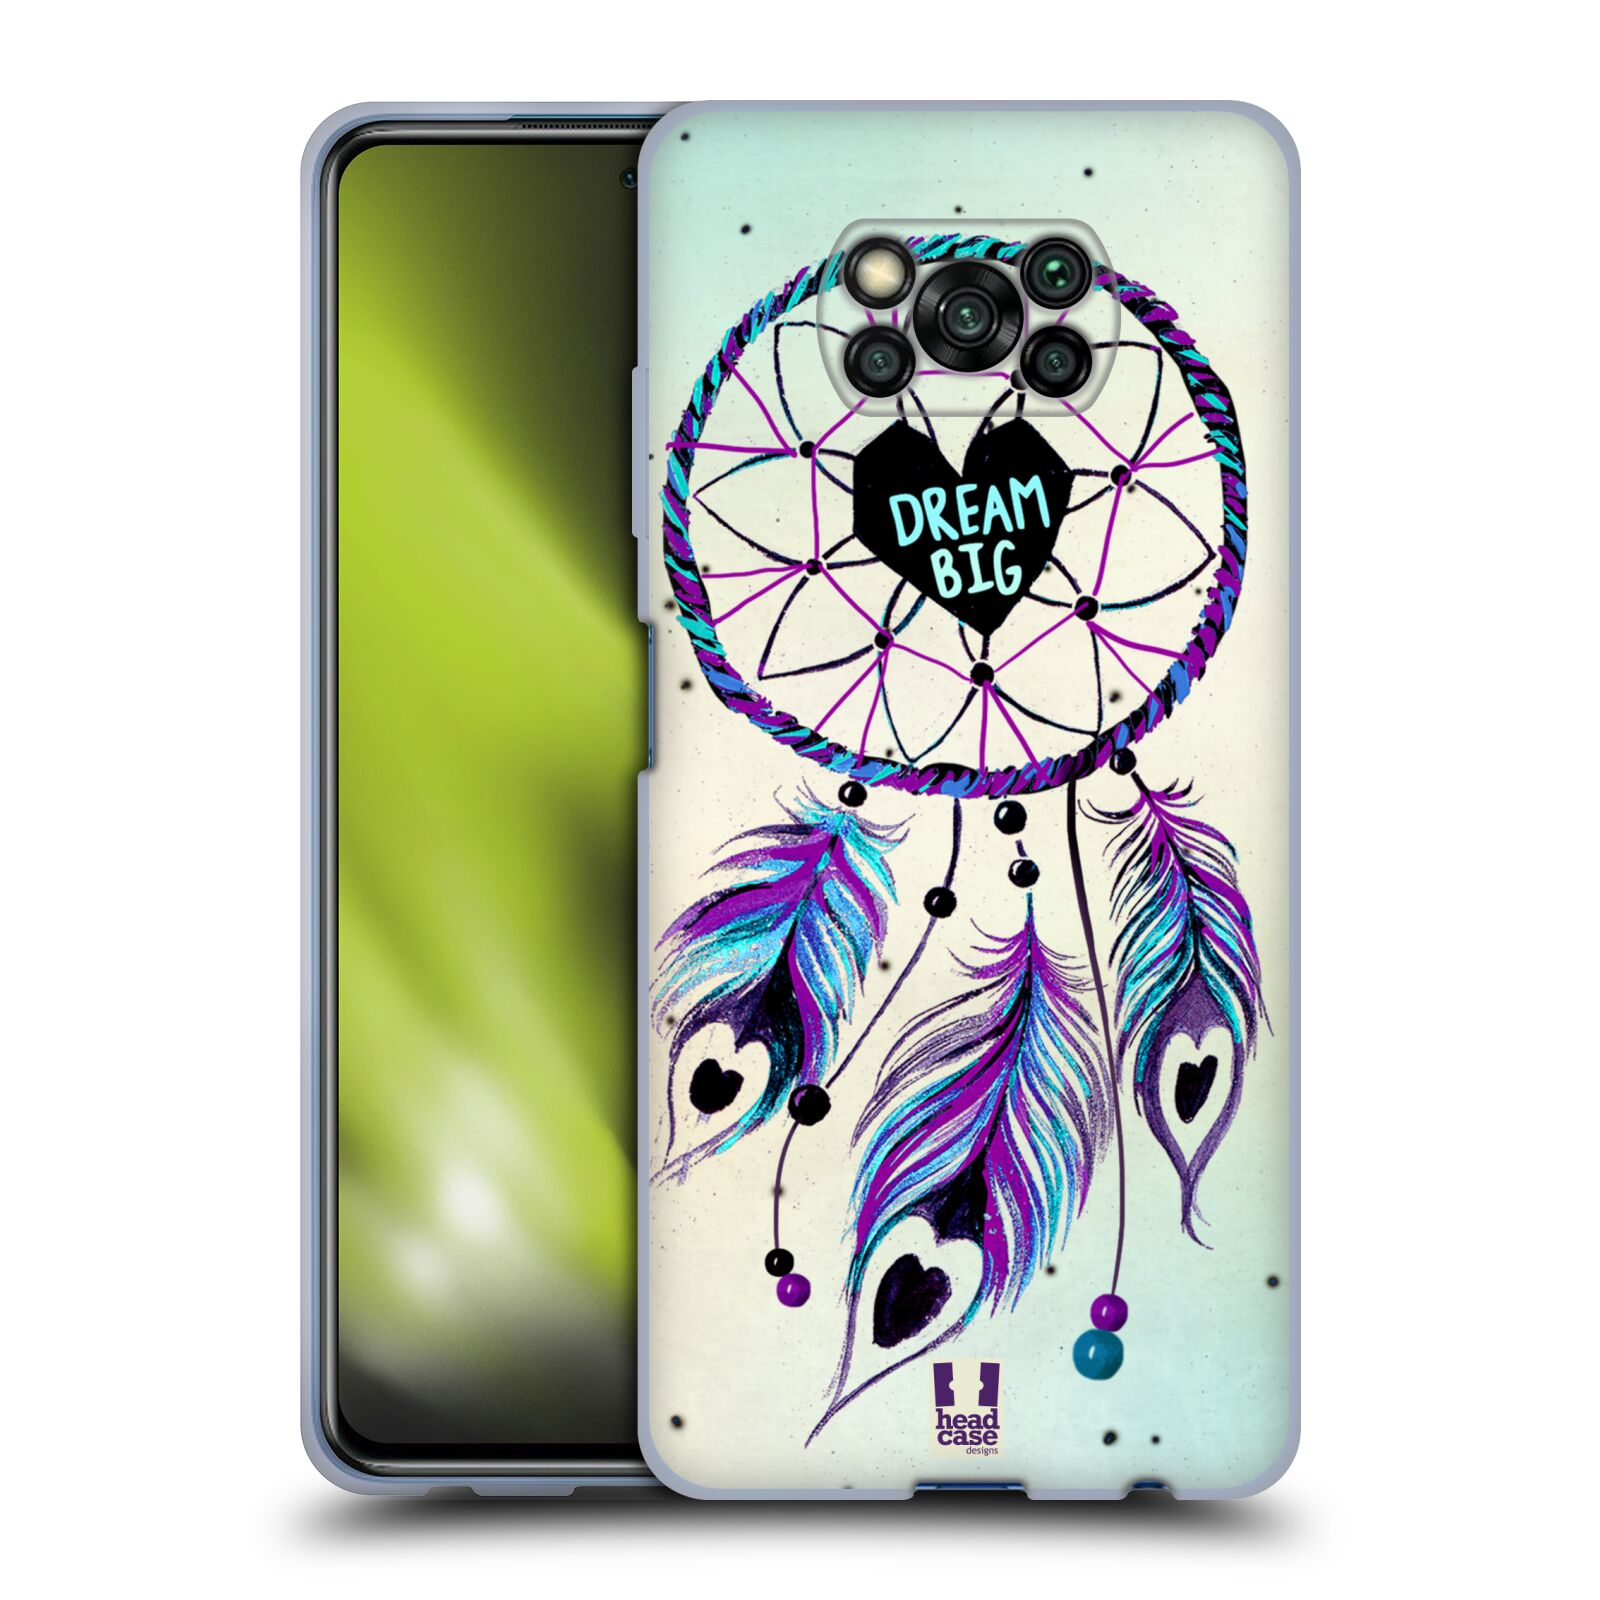 Silikonové pouzdro na mobil Xiaomi Poco X3 NFC - Head Case - Lapač Assorted Dream Big Srdce